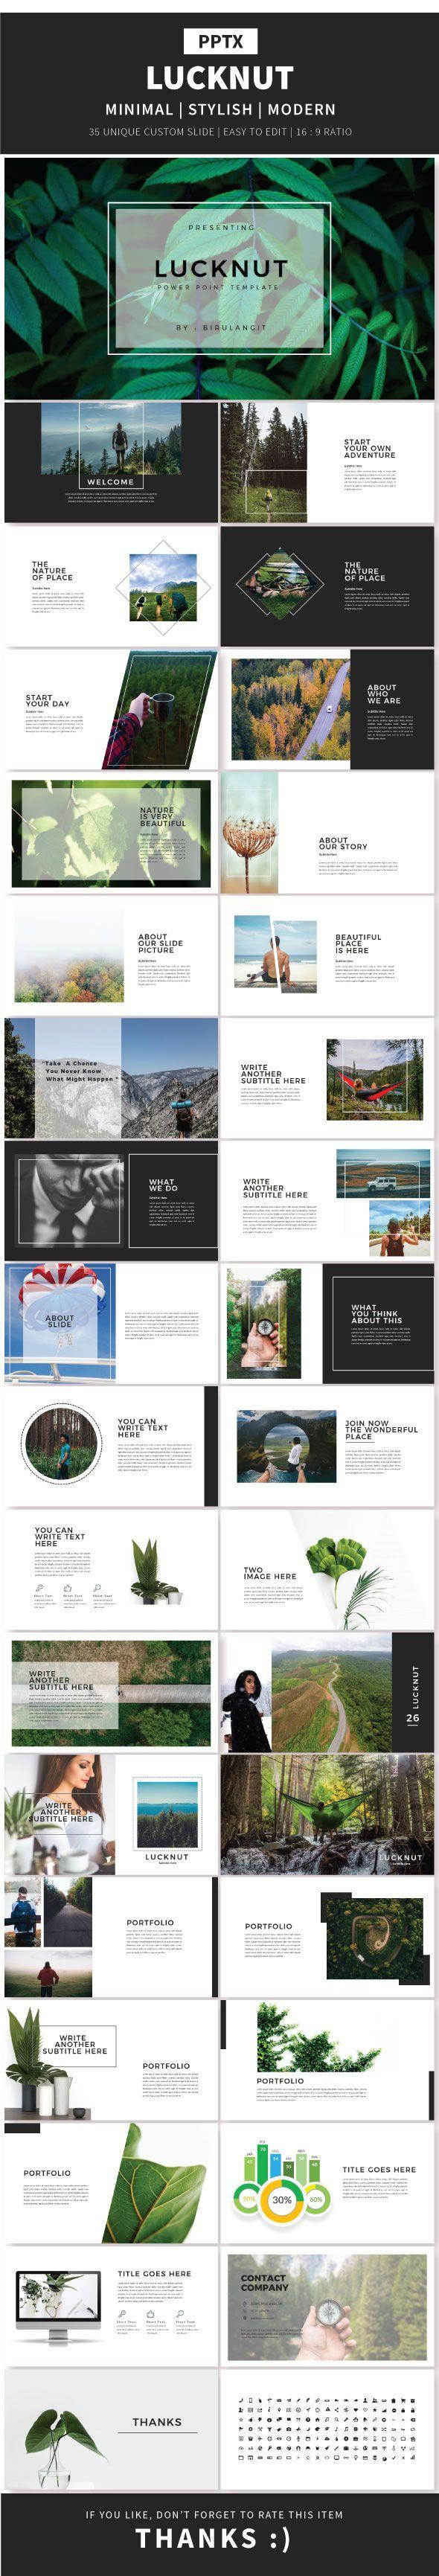 Lucknut Multipurpose Template - Creative PowerPoint Templates